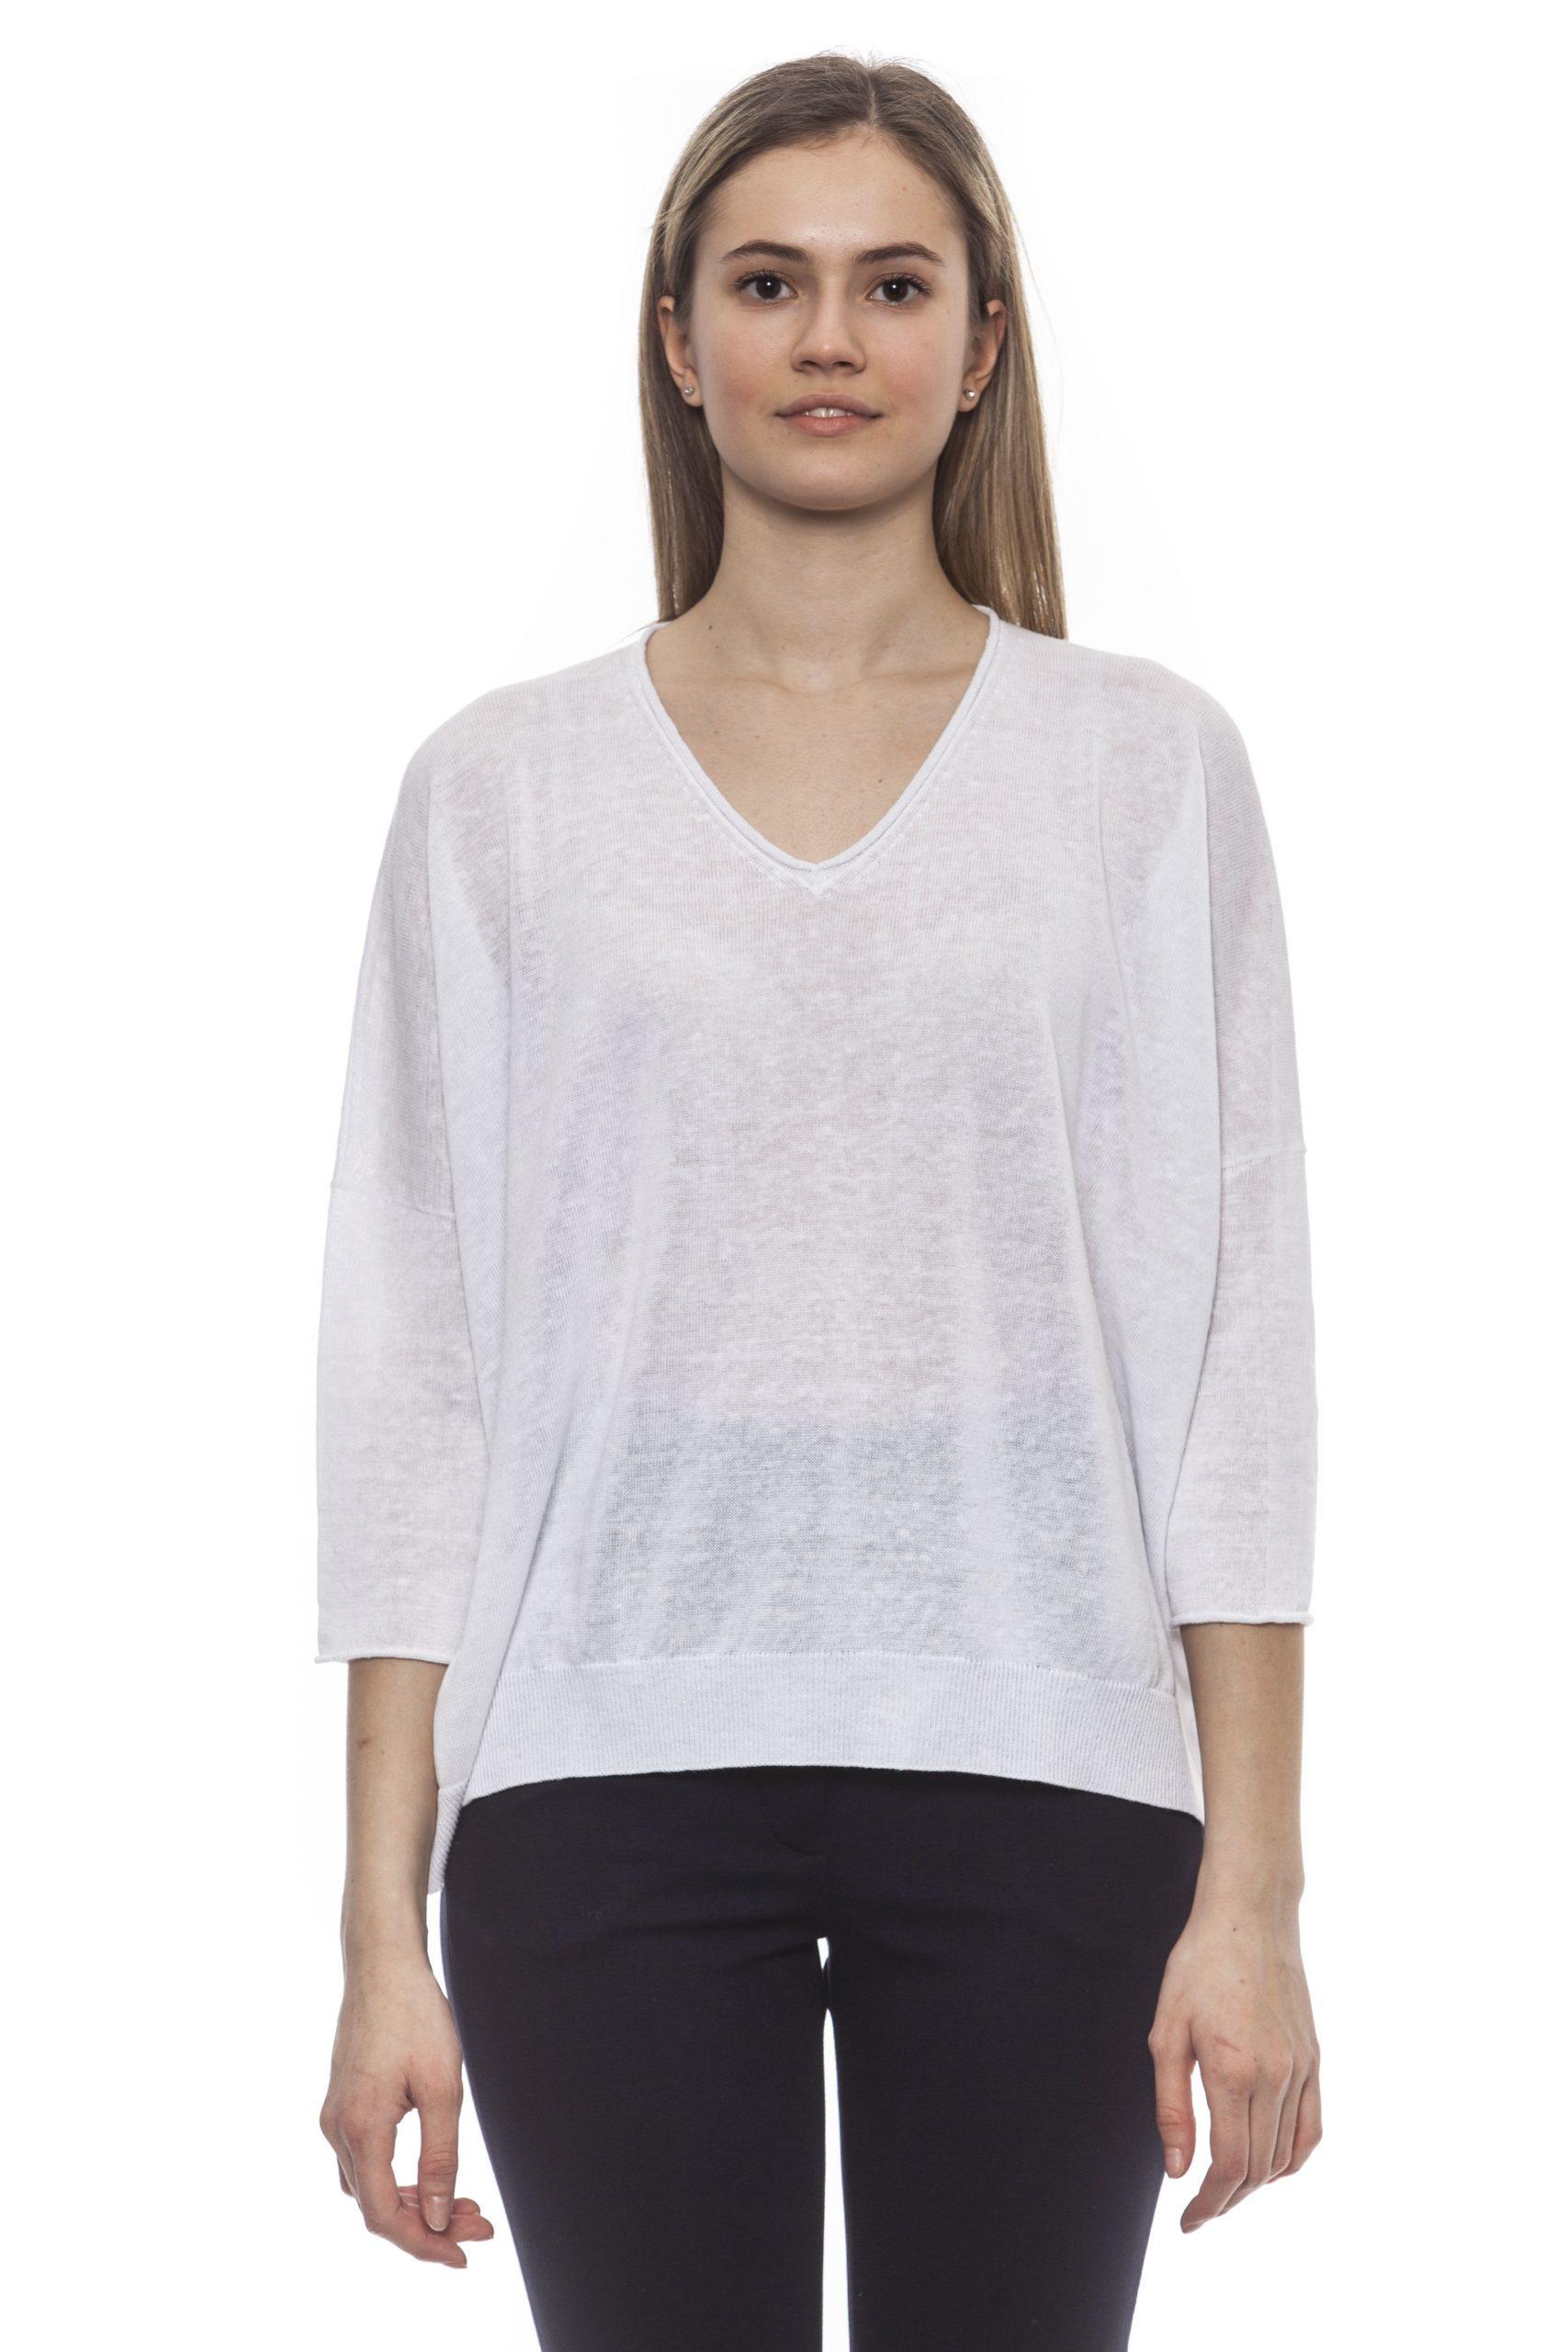 Peserico Women's Bianco Sweater White PE1383114 - IT42 | S